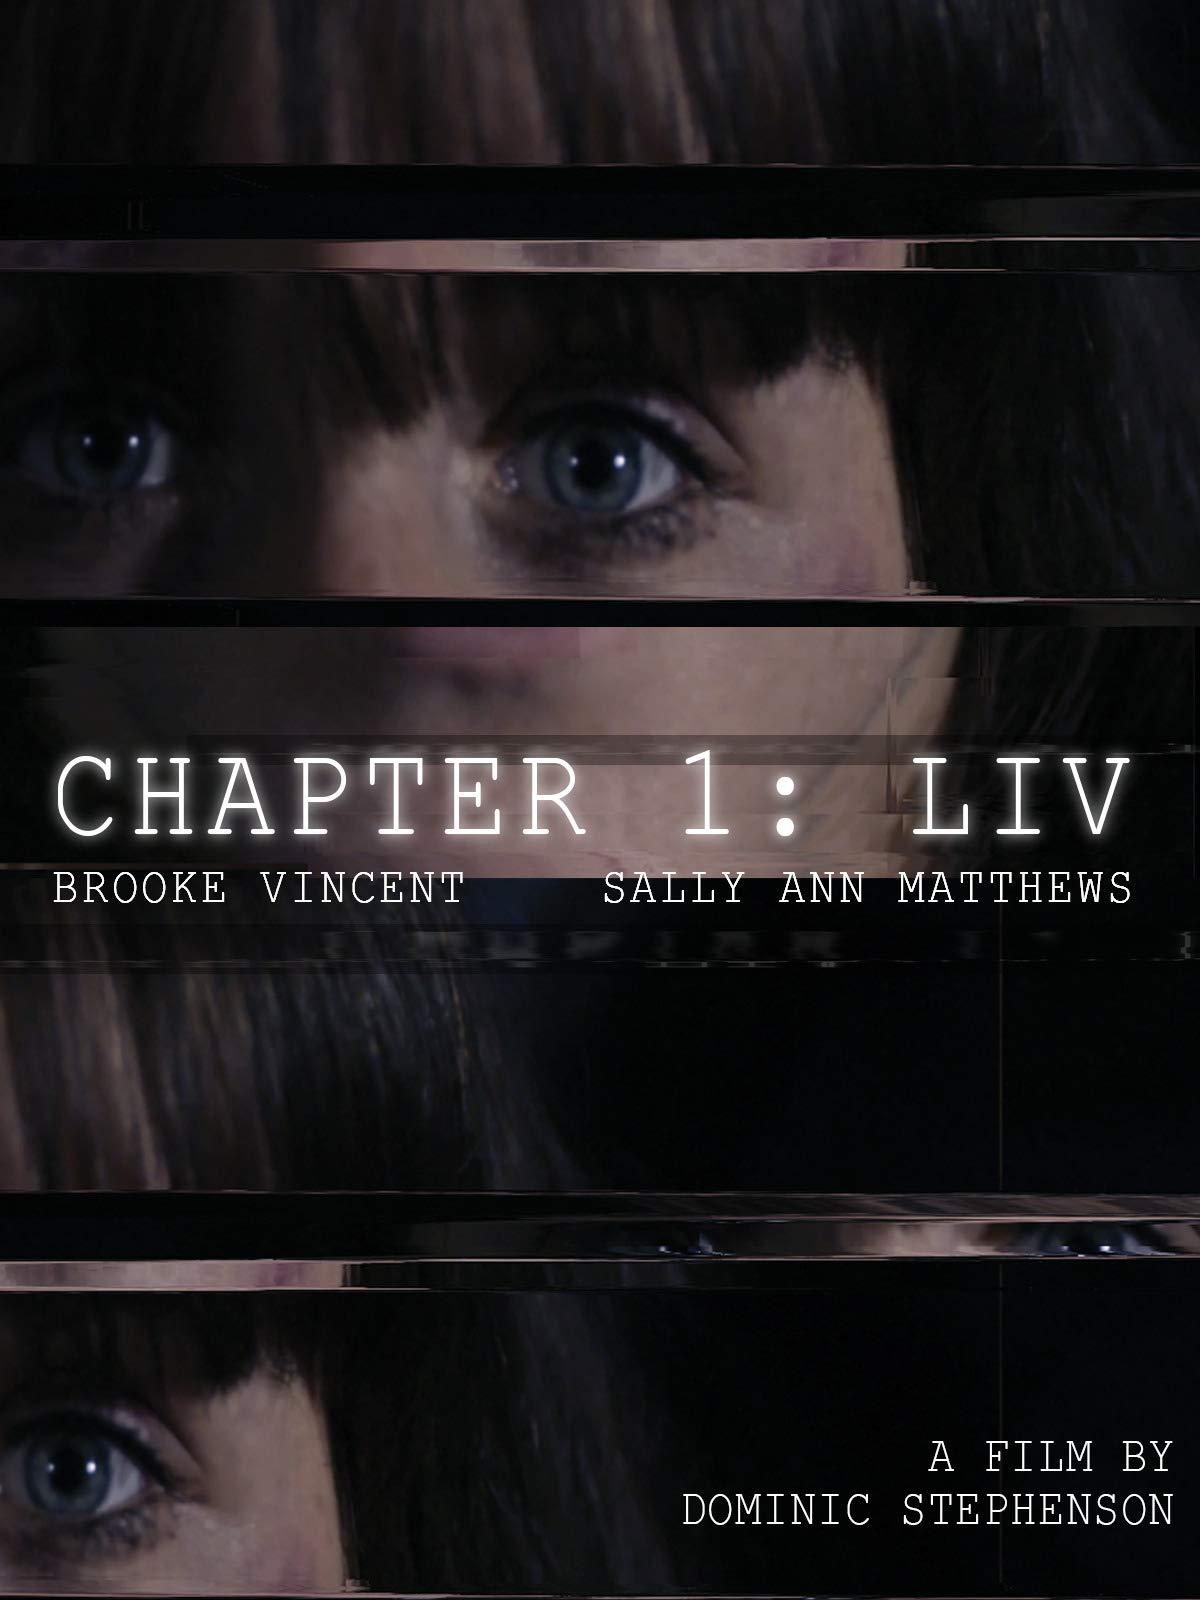 Chapter 1: LIV